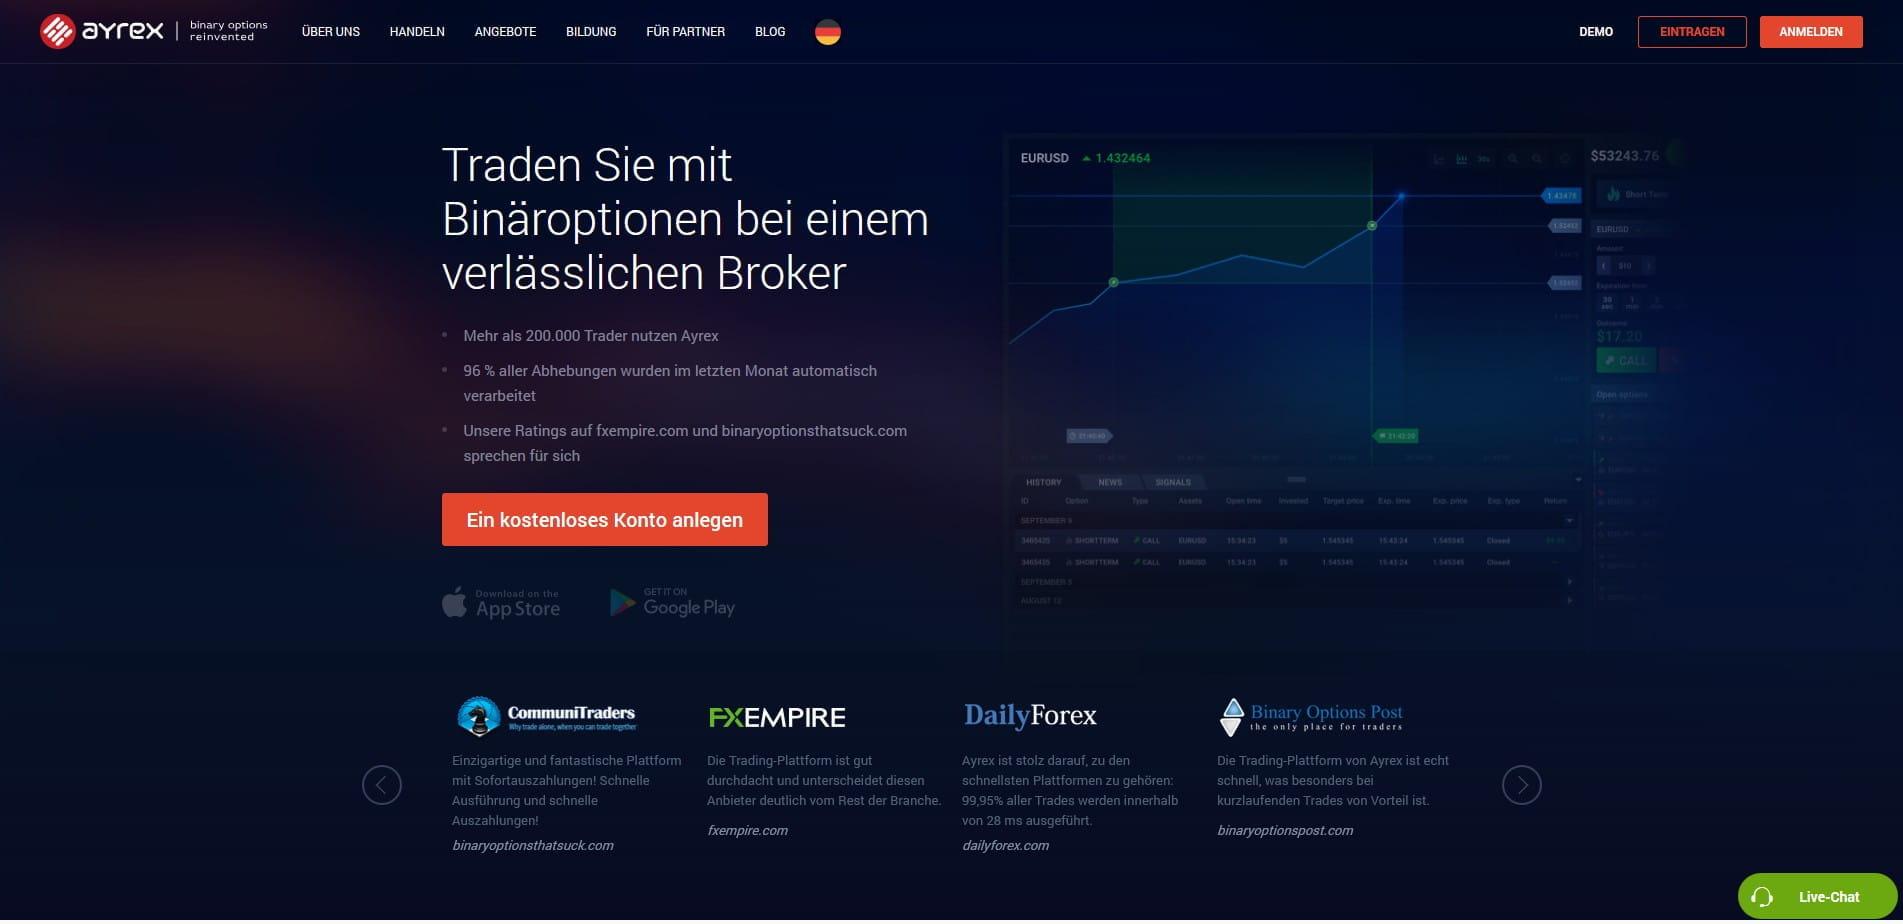 wie funktionieren trading apps